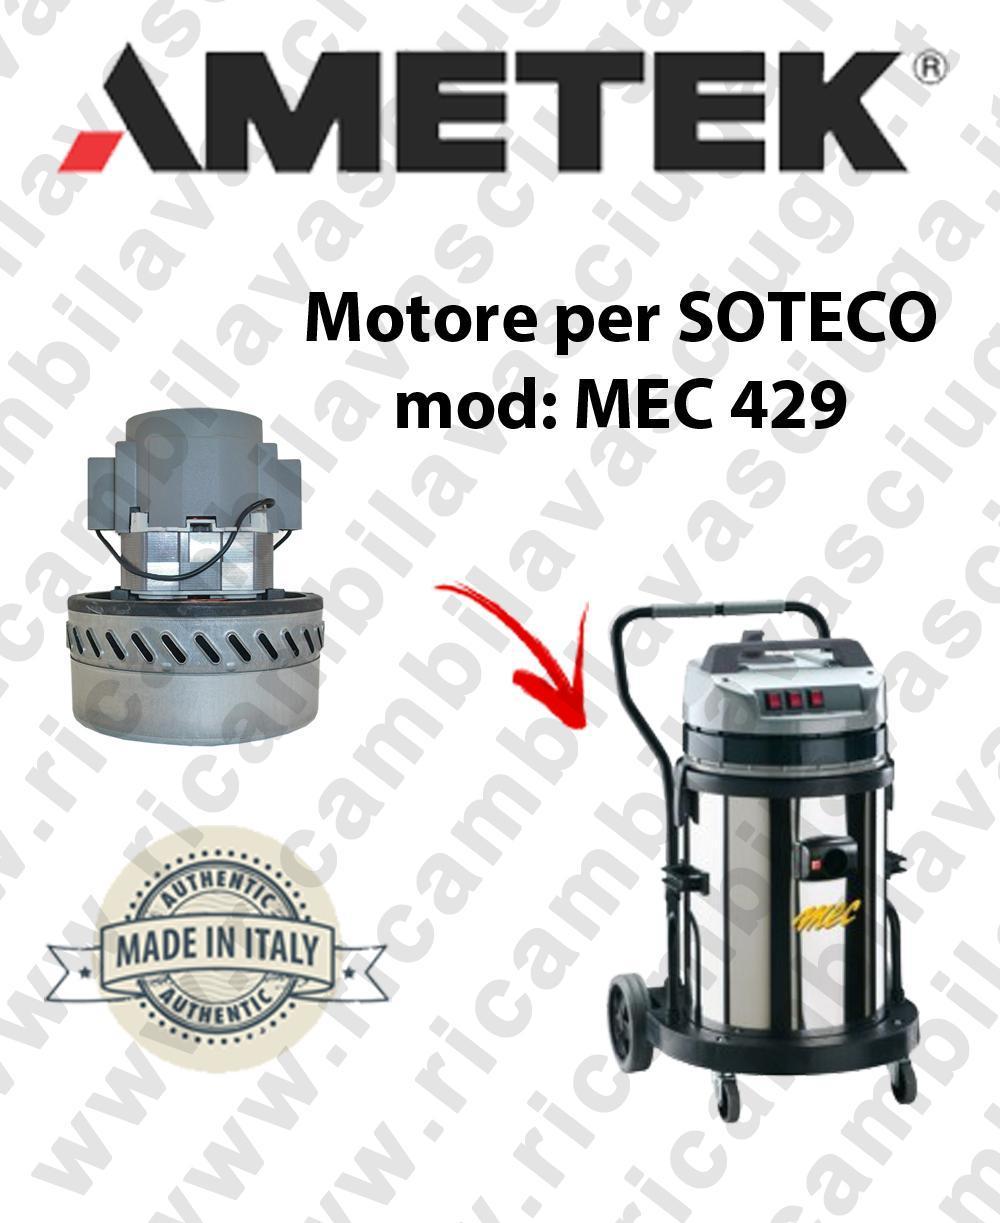 MEC 429 Ametek Vacuum Motor for vacuum cleaner SOTECO